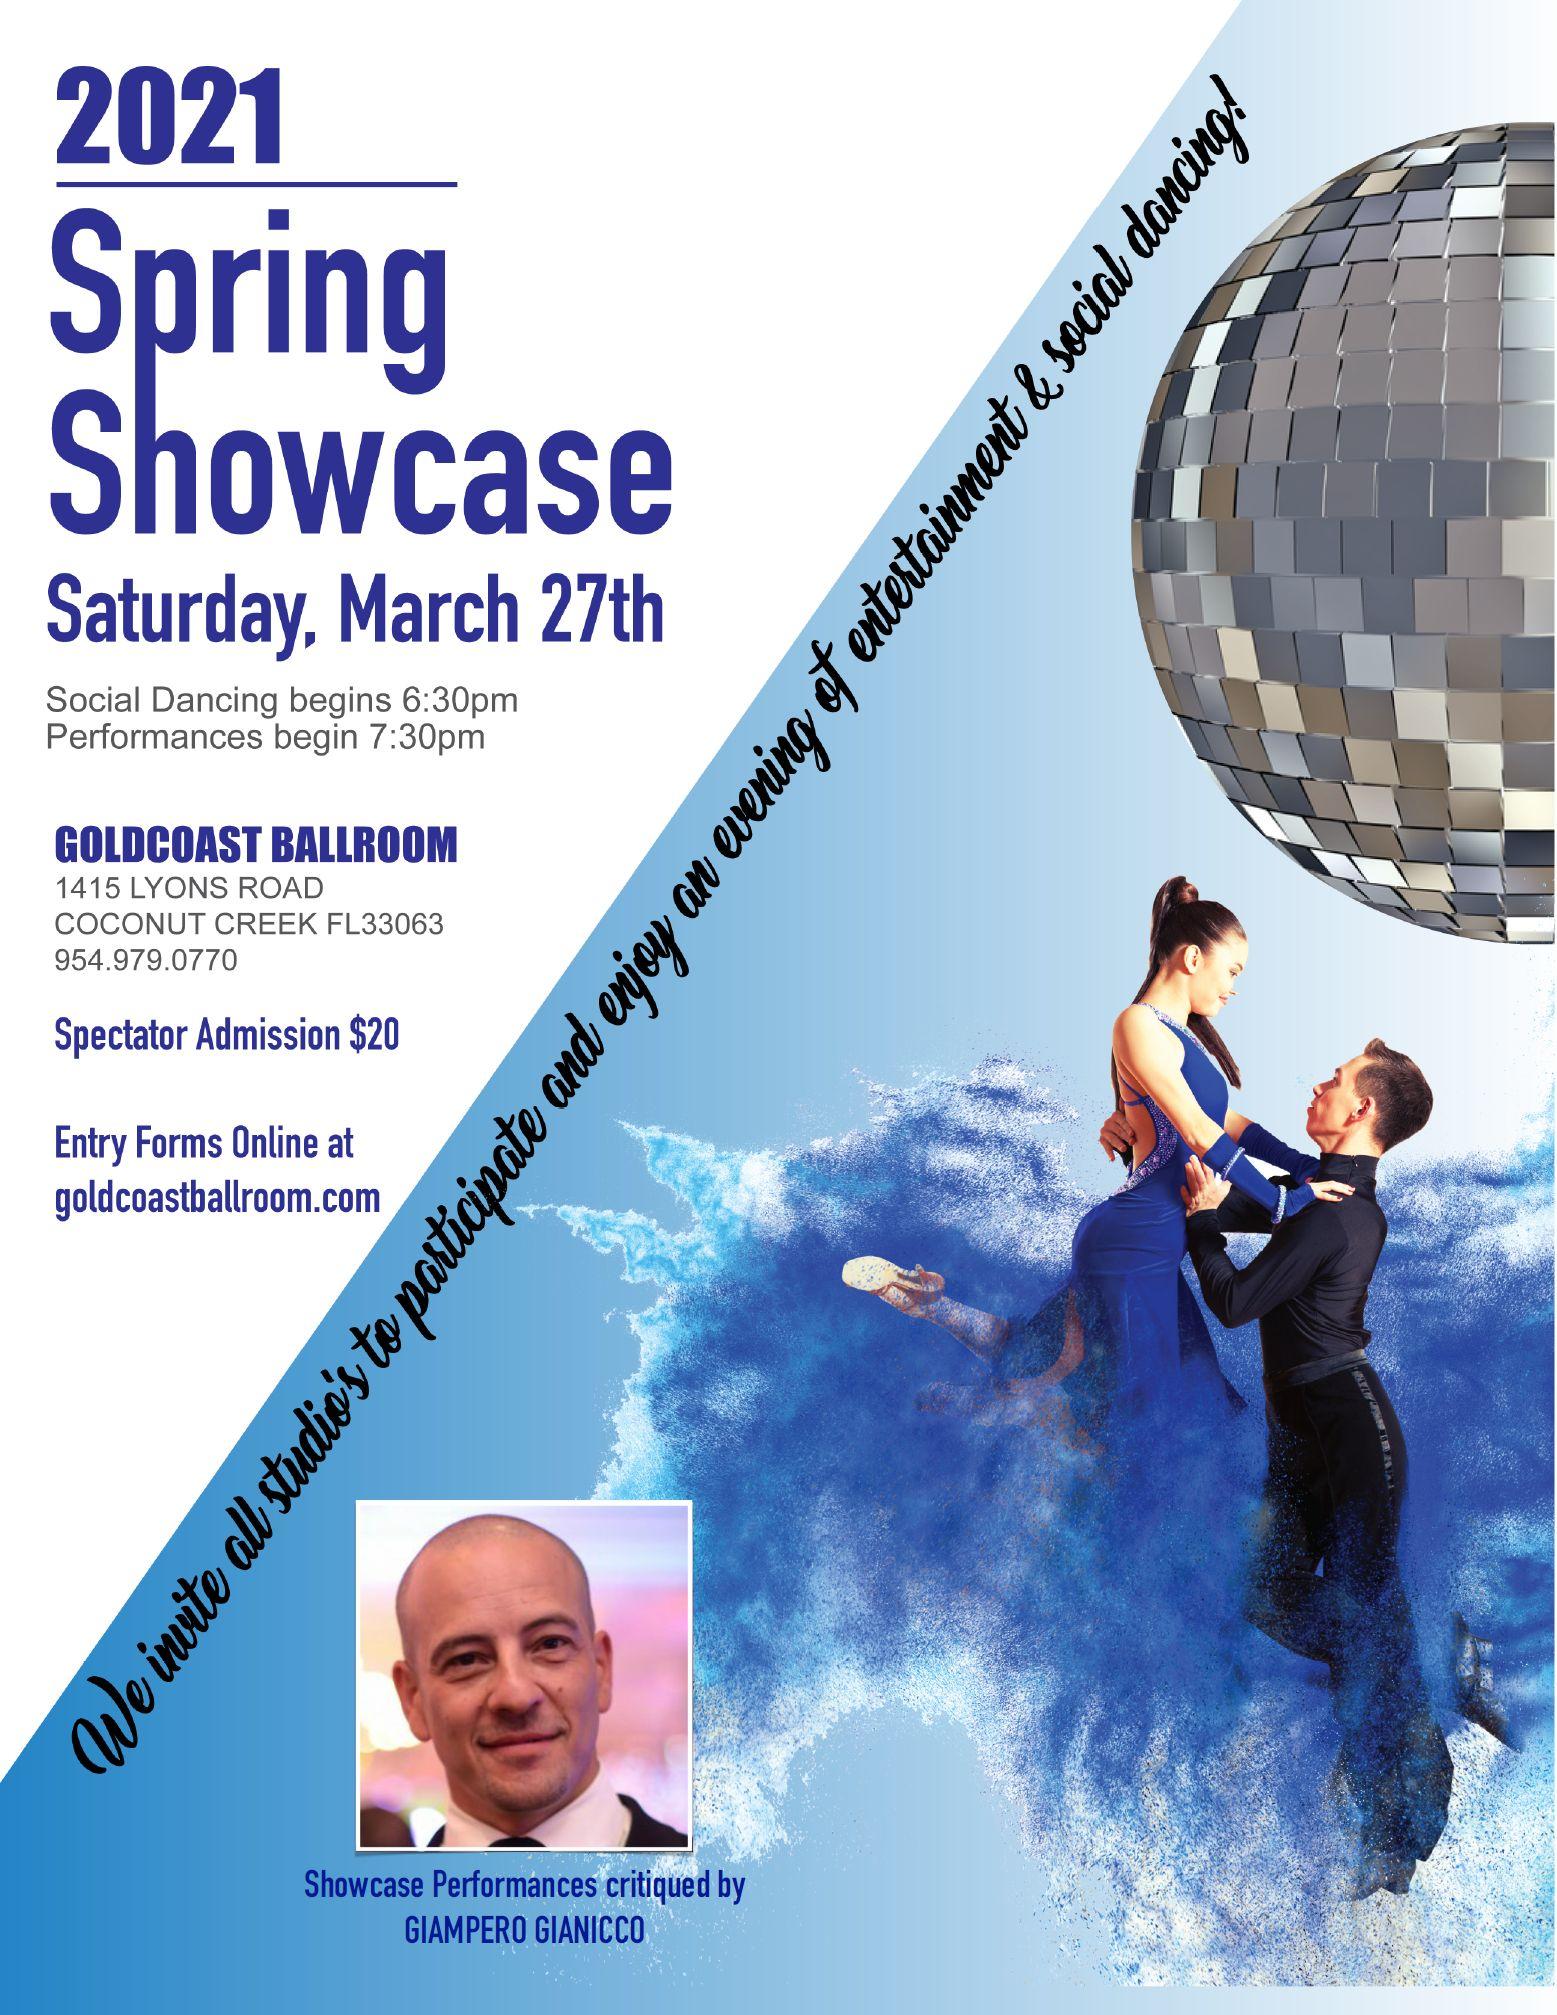 Goldcoast Ballroom 2021 Spring Showcase - March 27, 2021